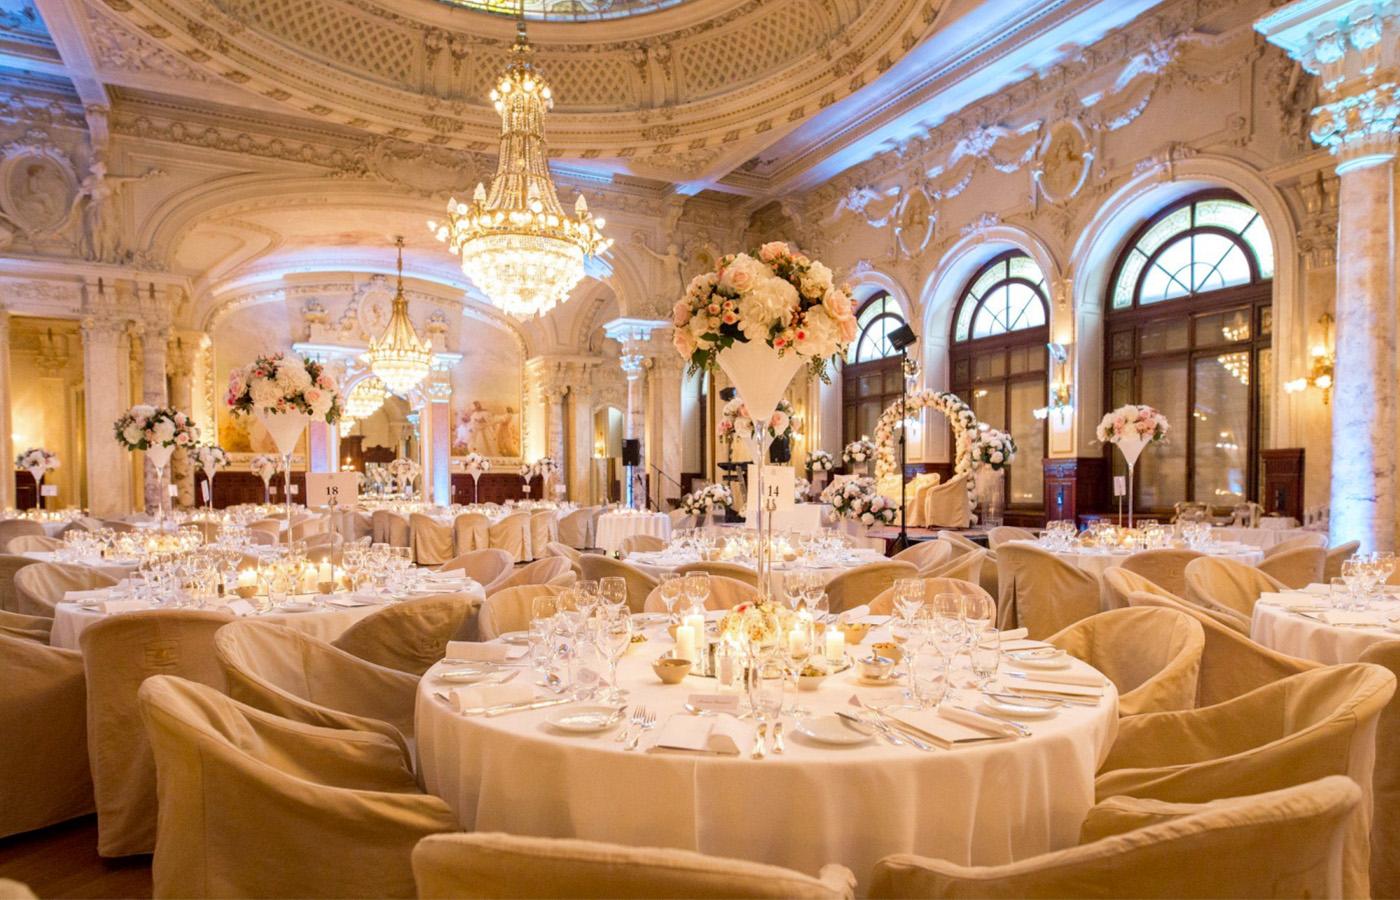 Ballroom for weddings in a luxury resort Lake Geneva